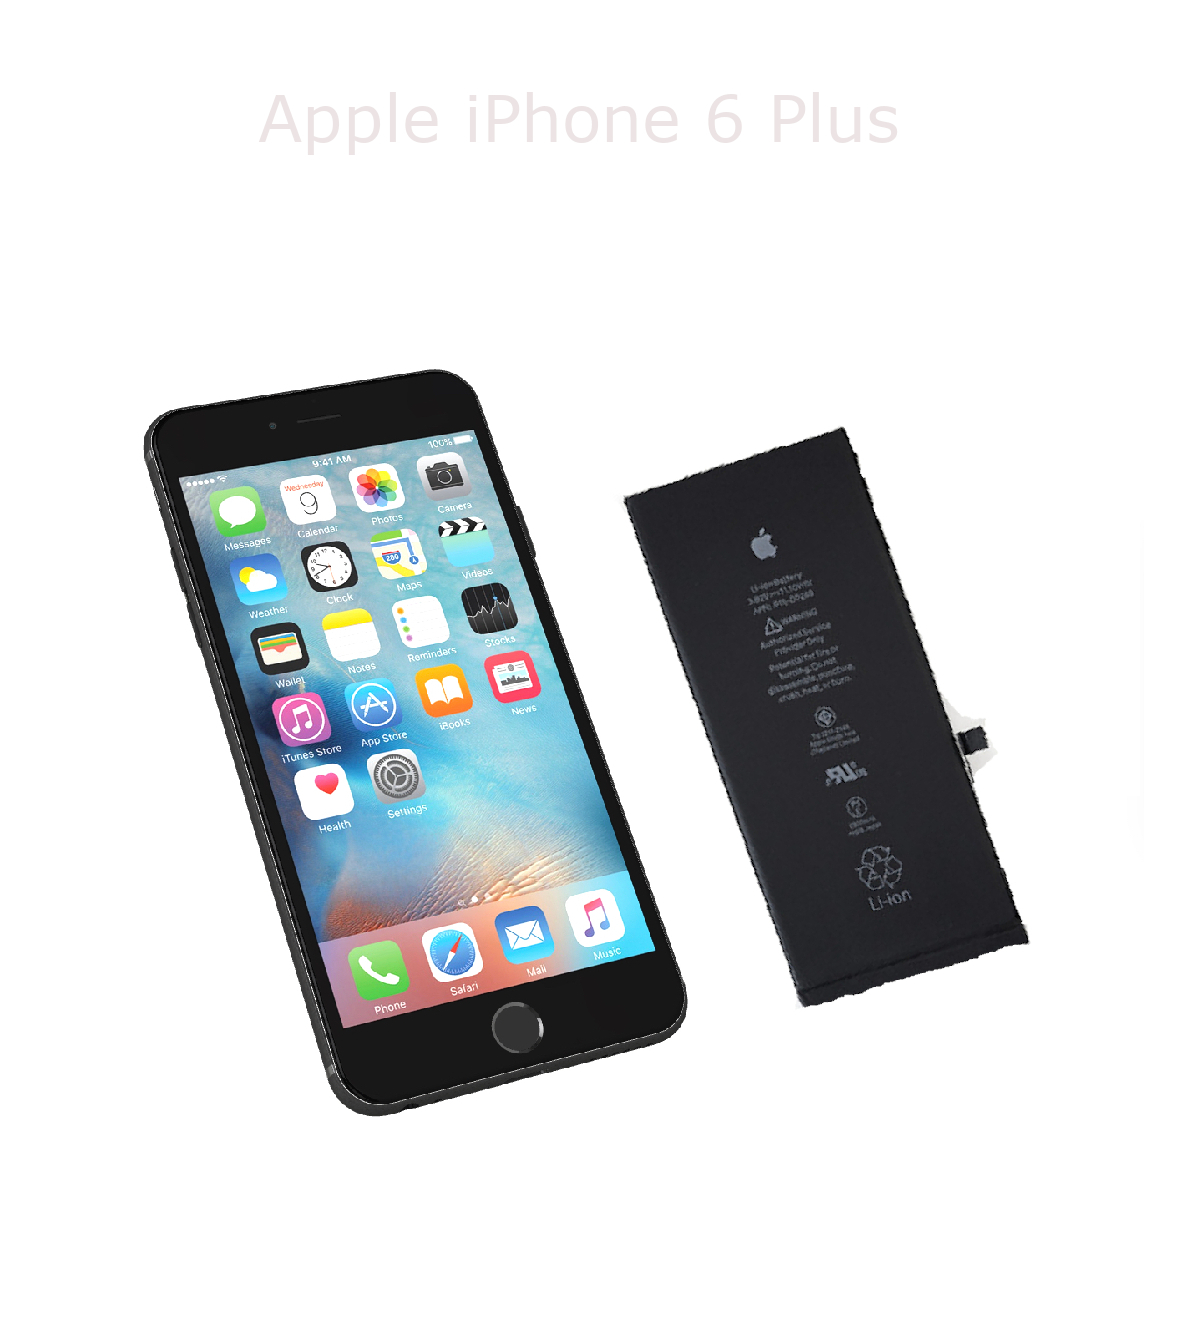 Byta batteri iPhone 6 plus